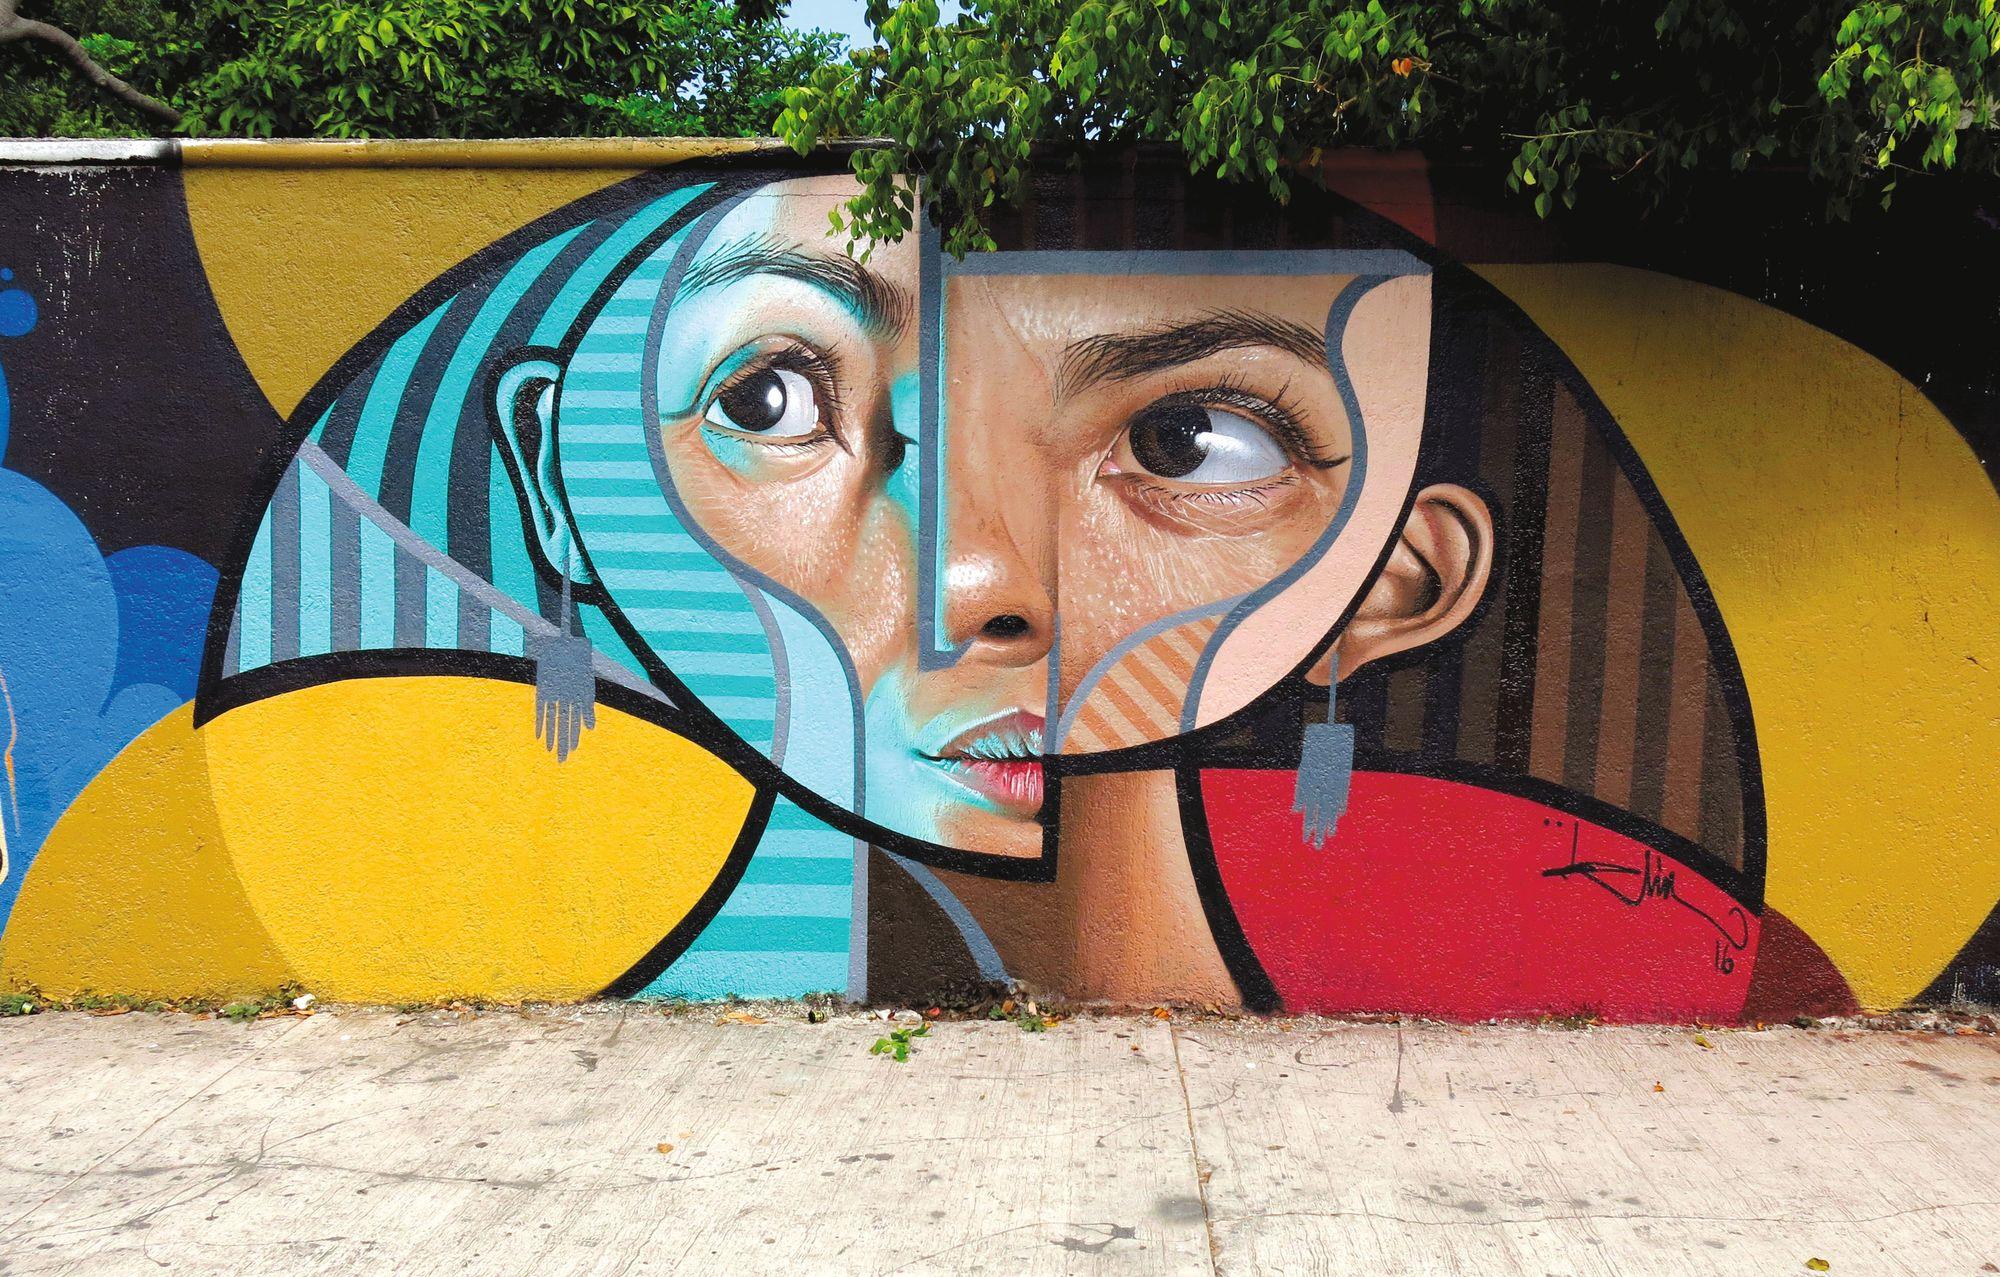 BELIN (Miguel Ángel Belinchón), FLAXT, mural en Cancún, México, 2016.